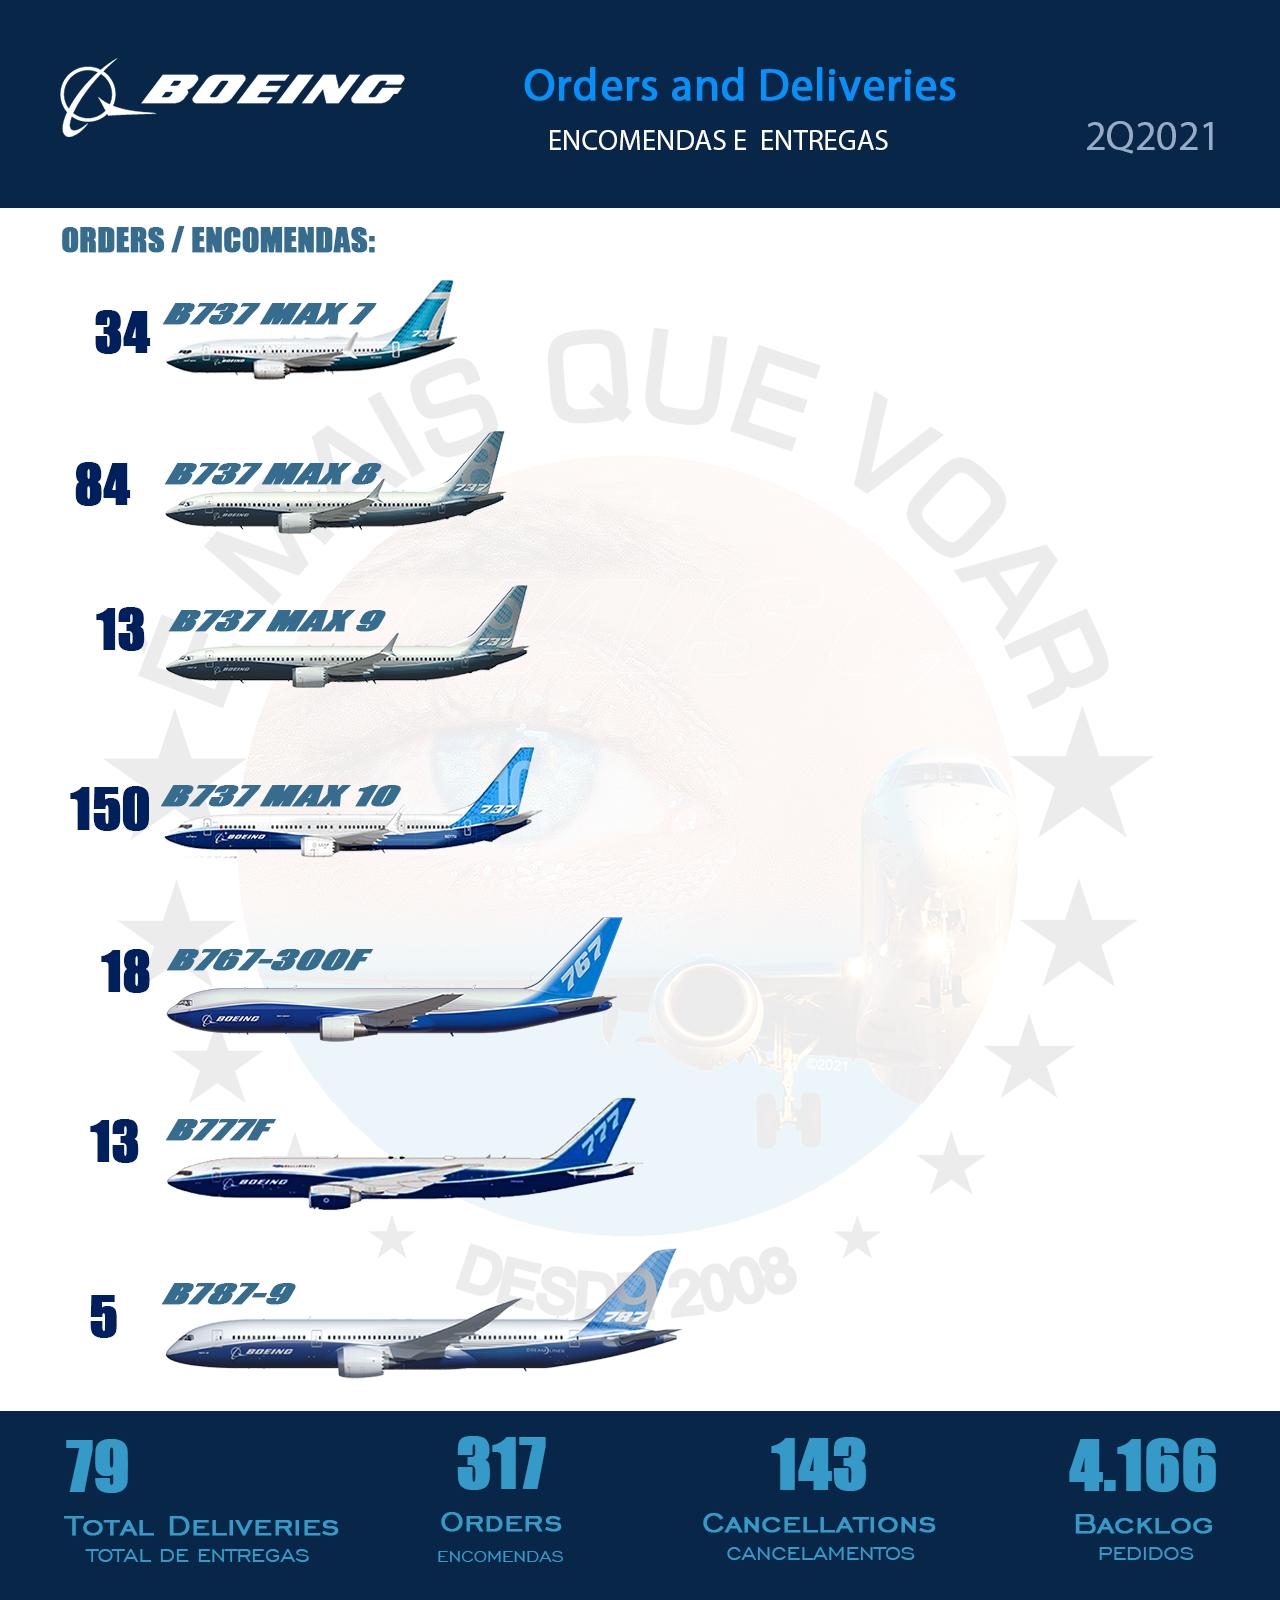 Boeing - encomendas de aeronaves no Segundo Trimestre de 2021 (2T2021)